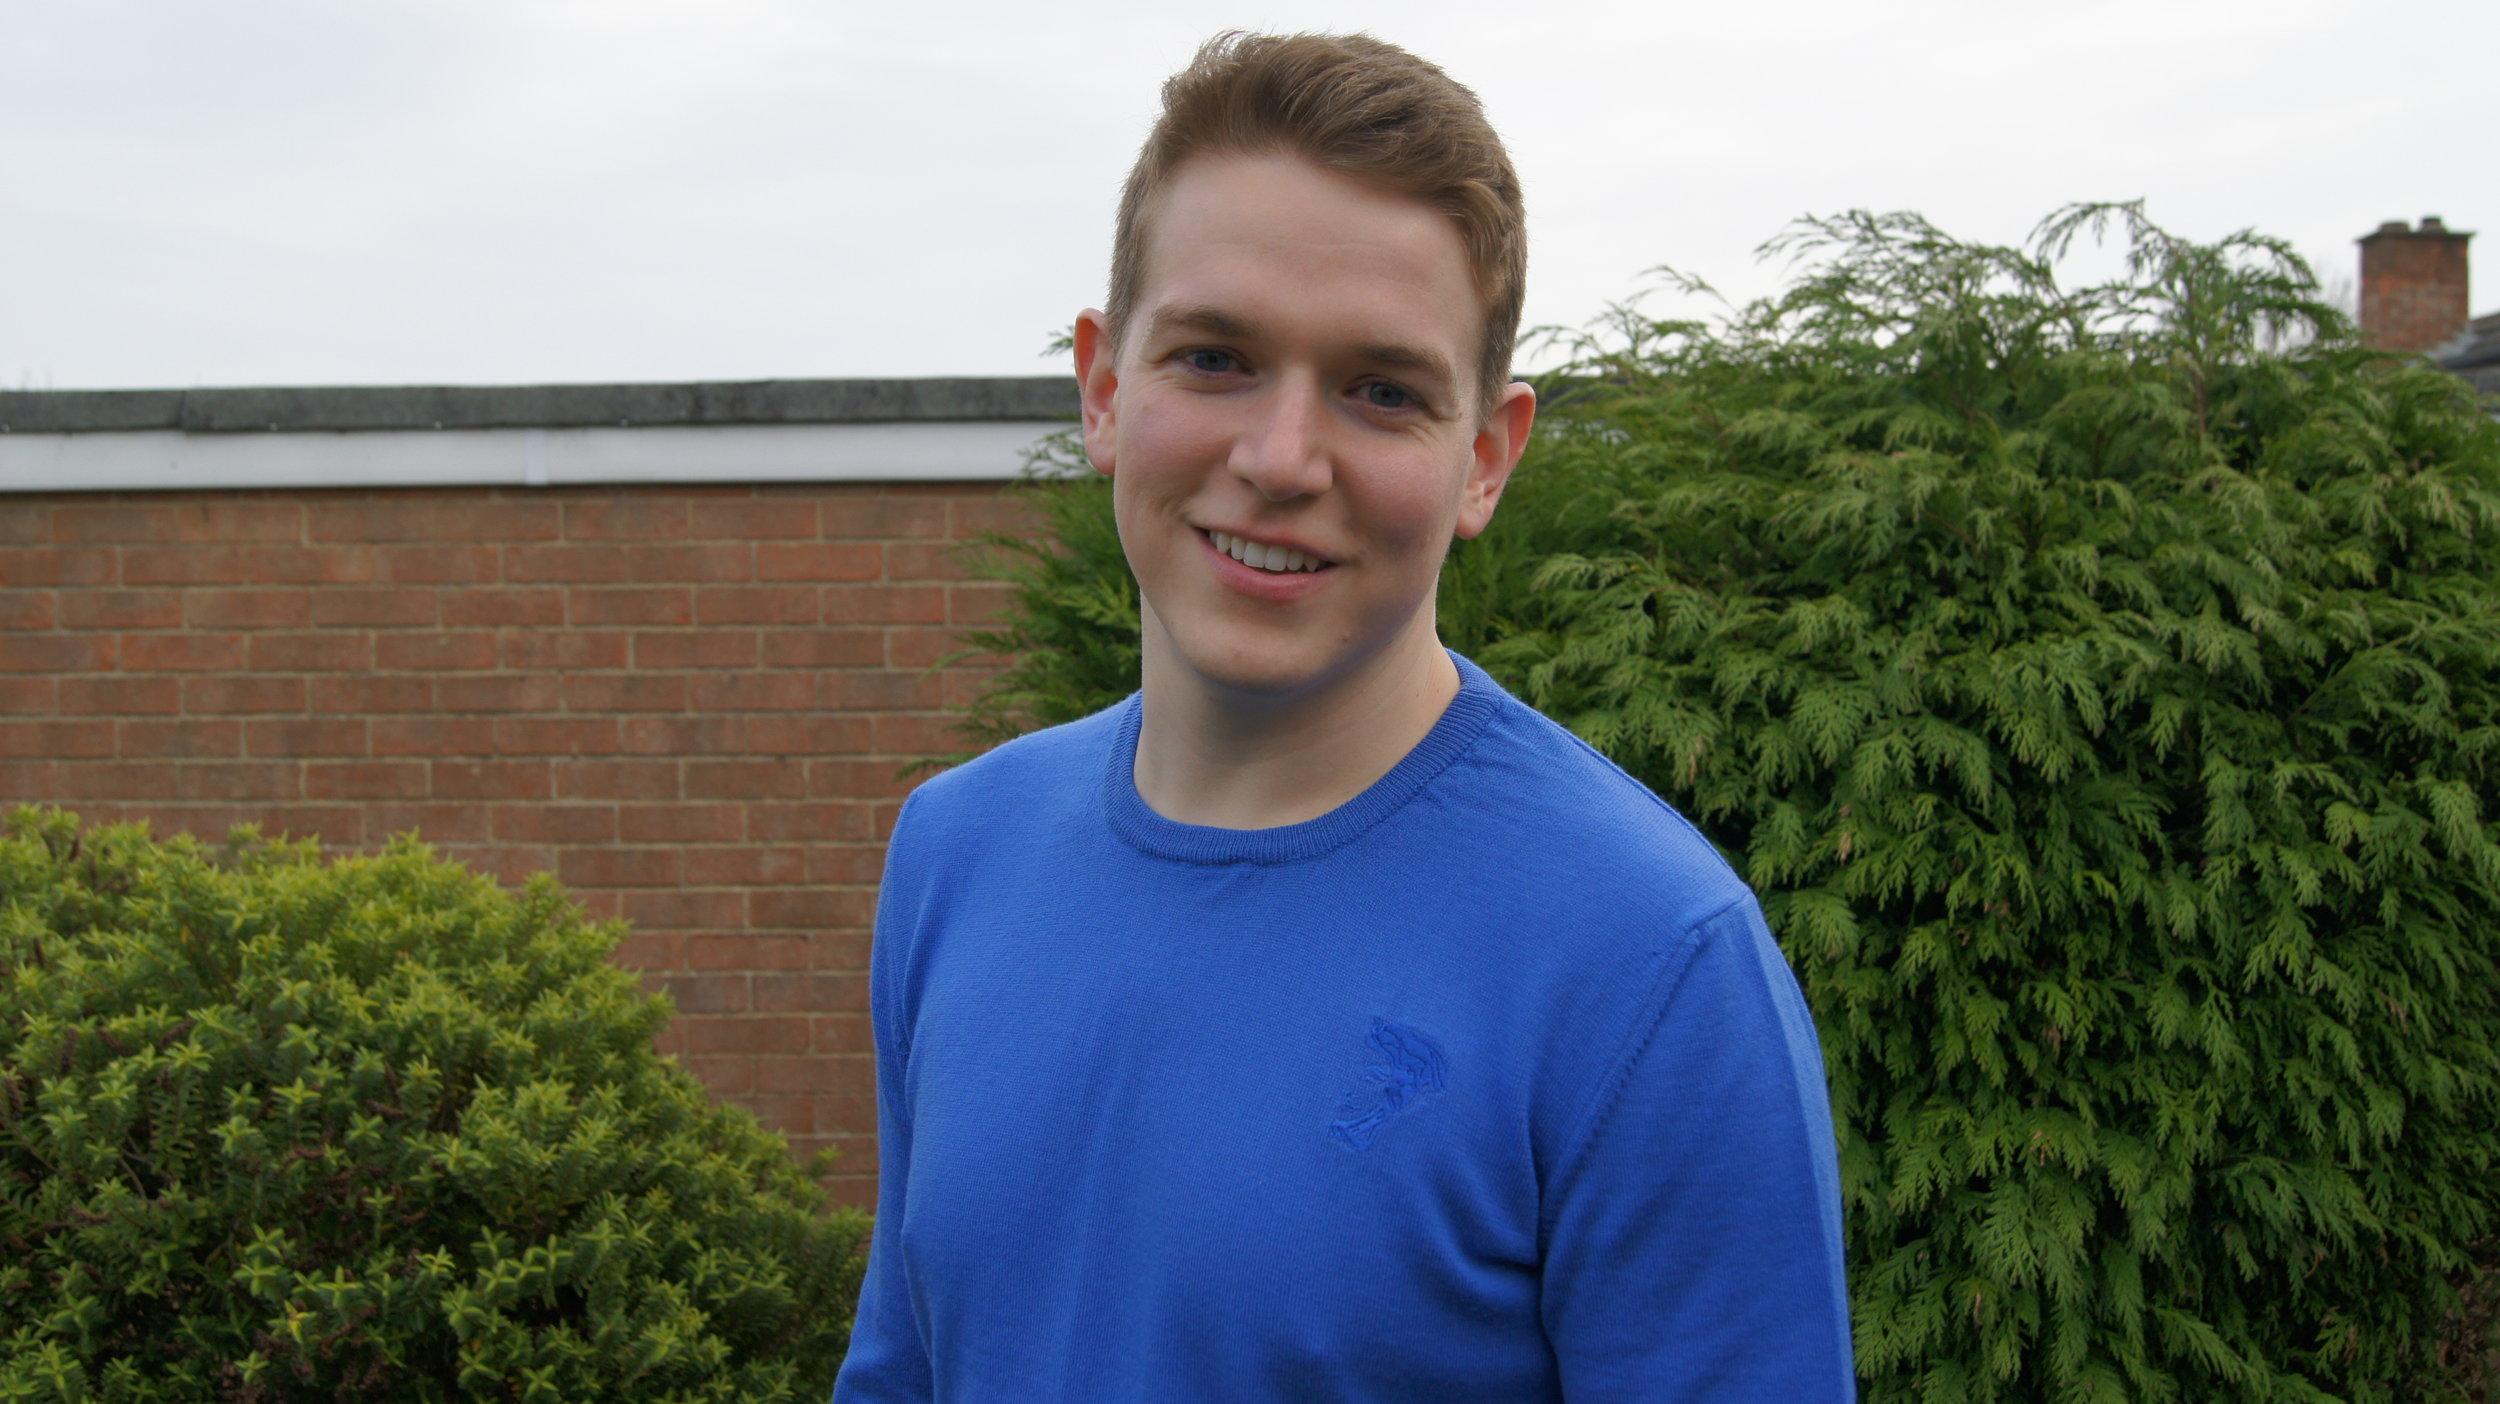 Bright Blue Digital Marketing - Jake Grose